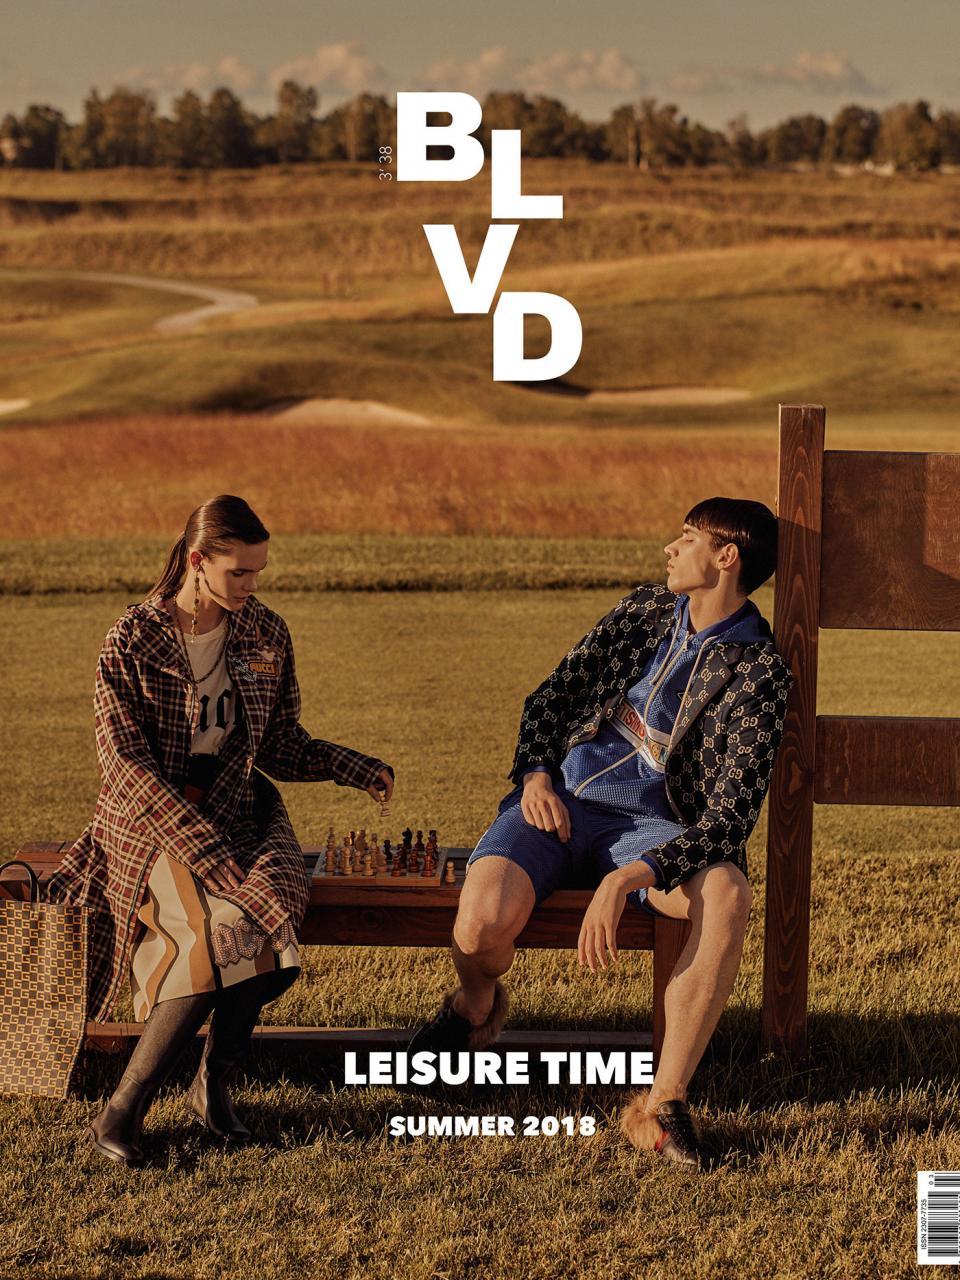 《BLVD》时尚杂志 2018年夏 摄影作品 时尚图库 第11张